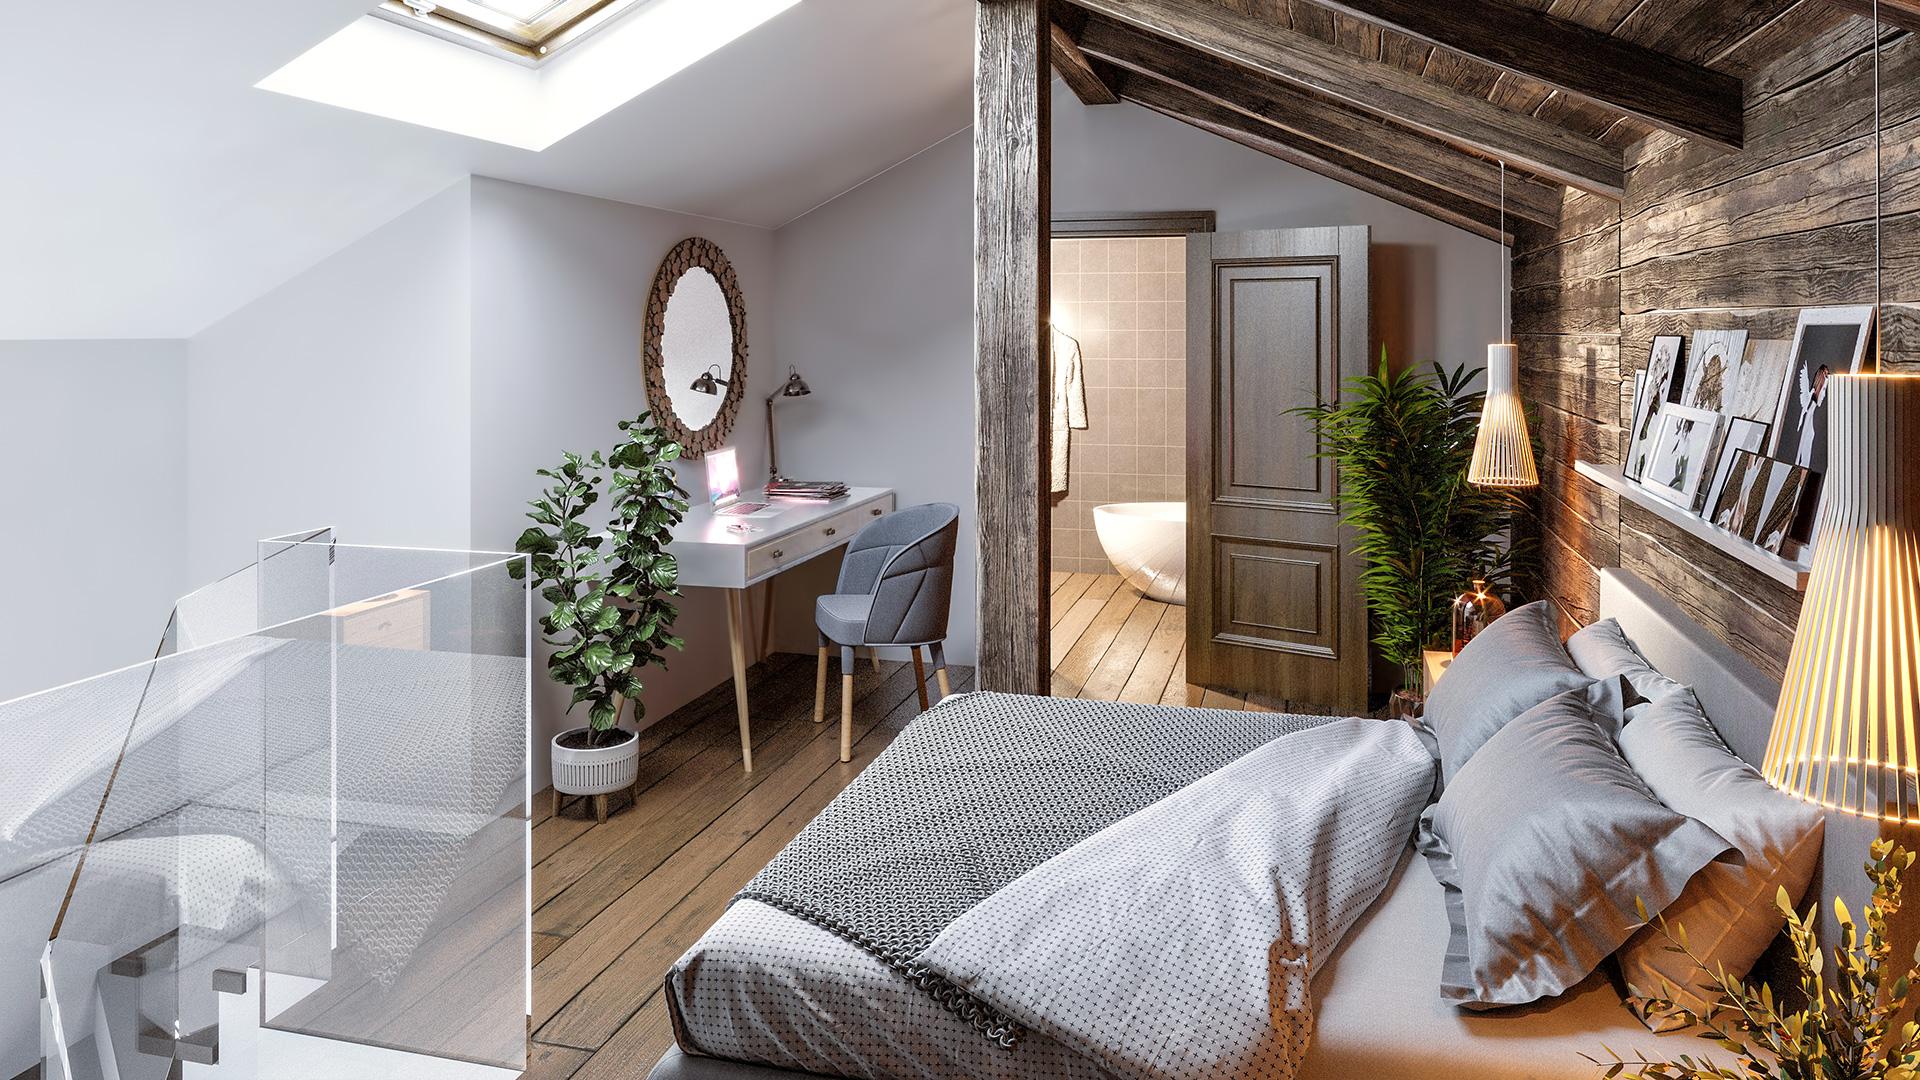 La Ferme de Morz'na Apartments, France